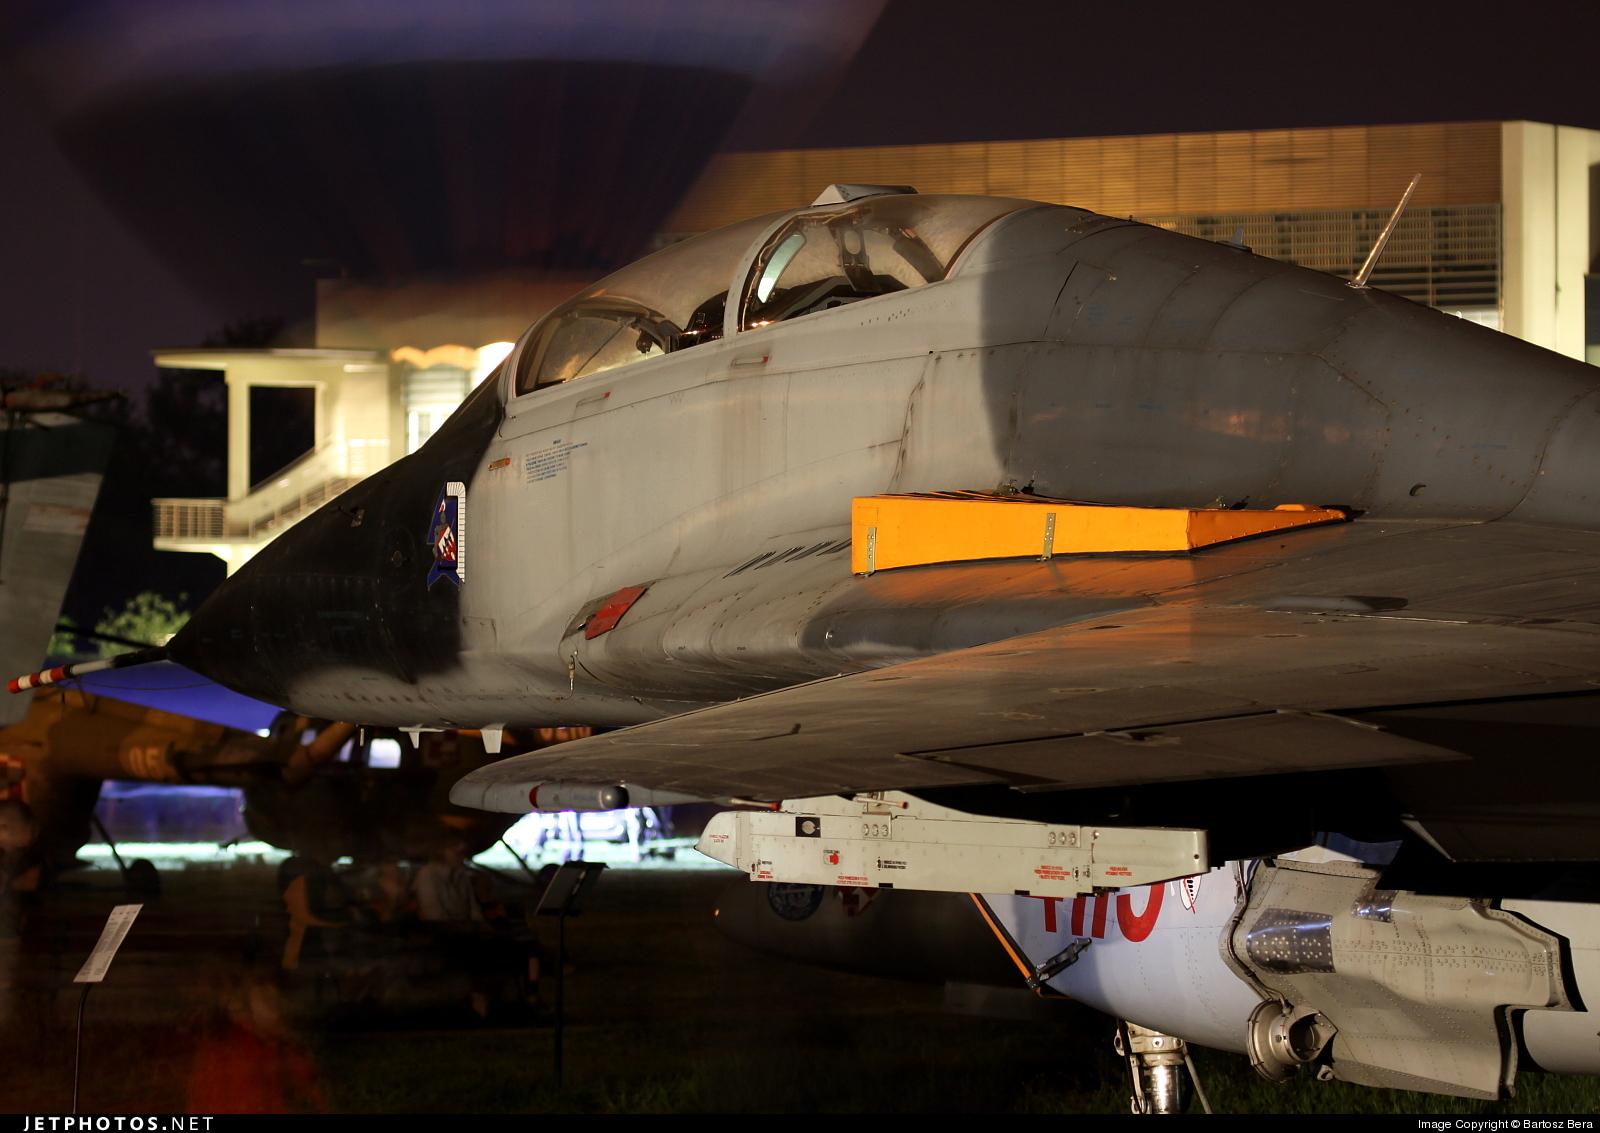 4115 - Mikoyan-Gurevich MiG-29UB Fulcrum - Poland - Air Force